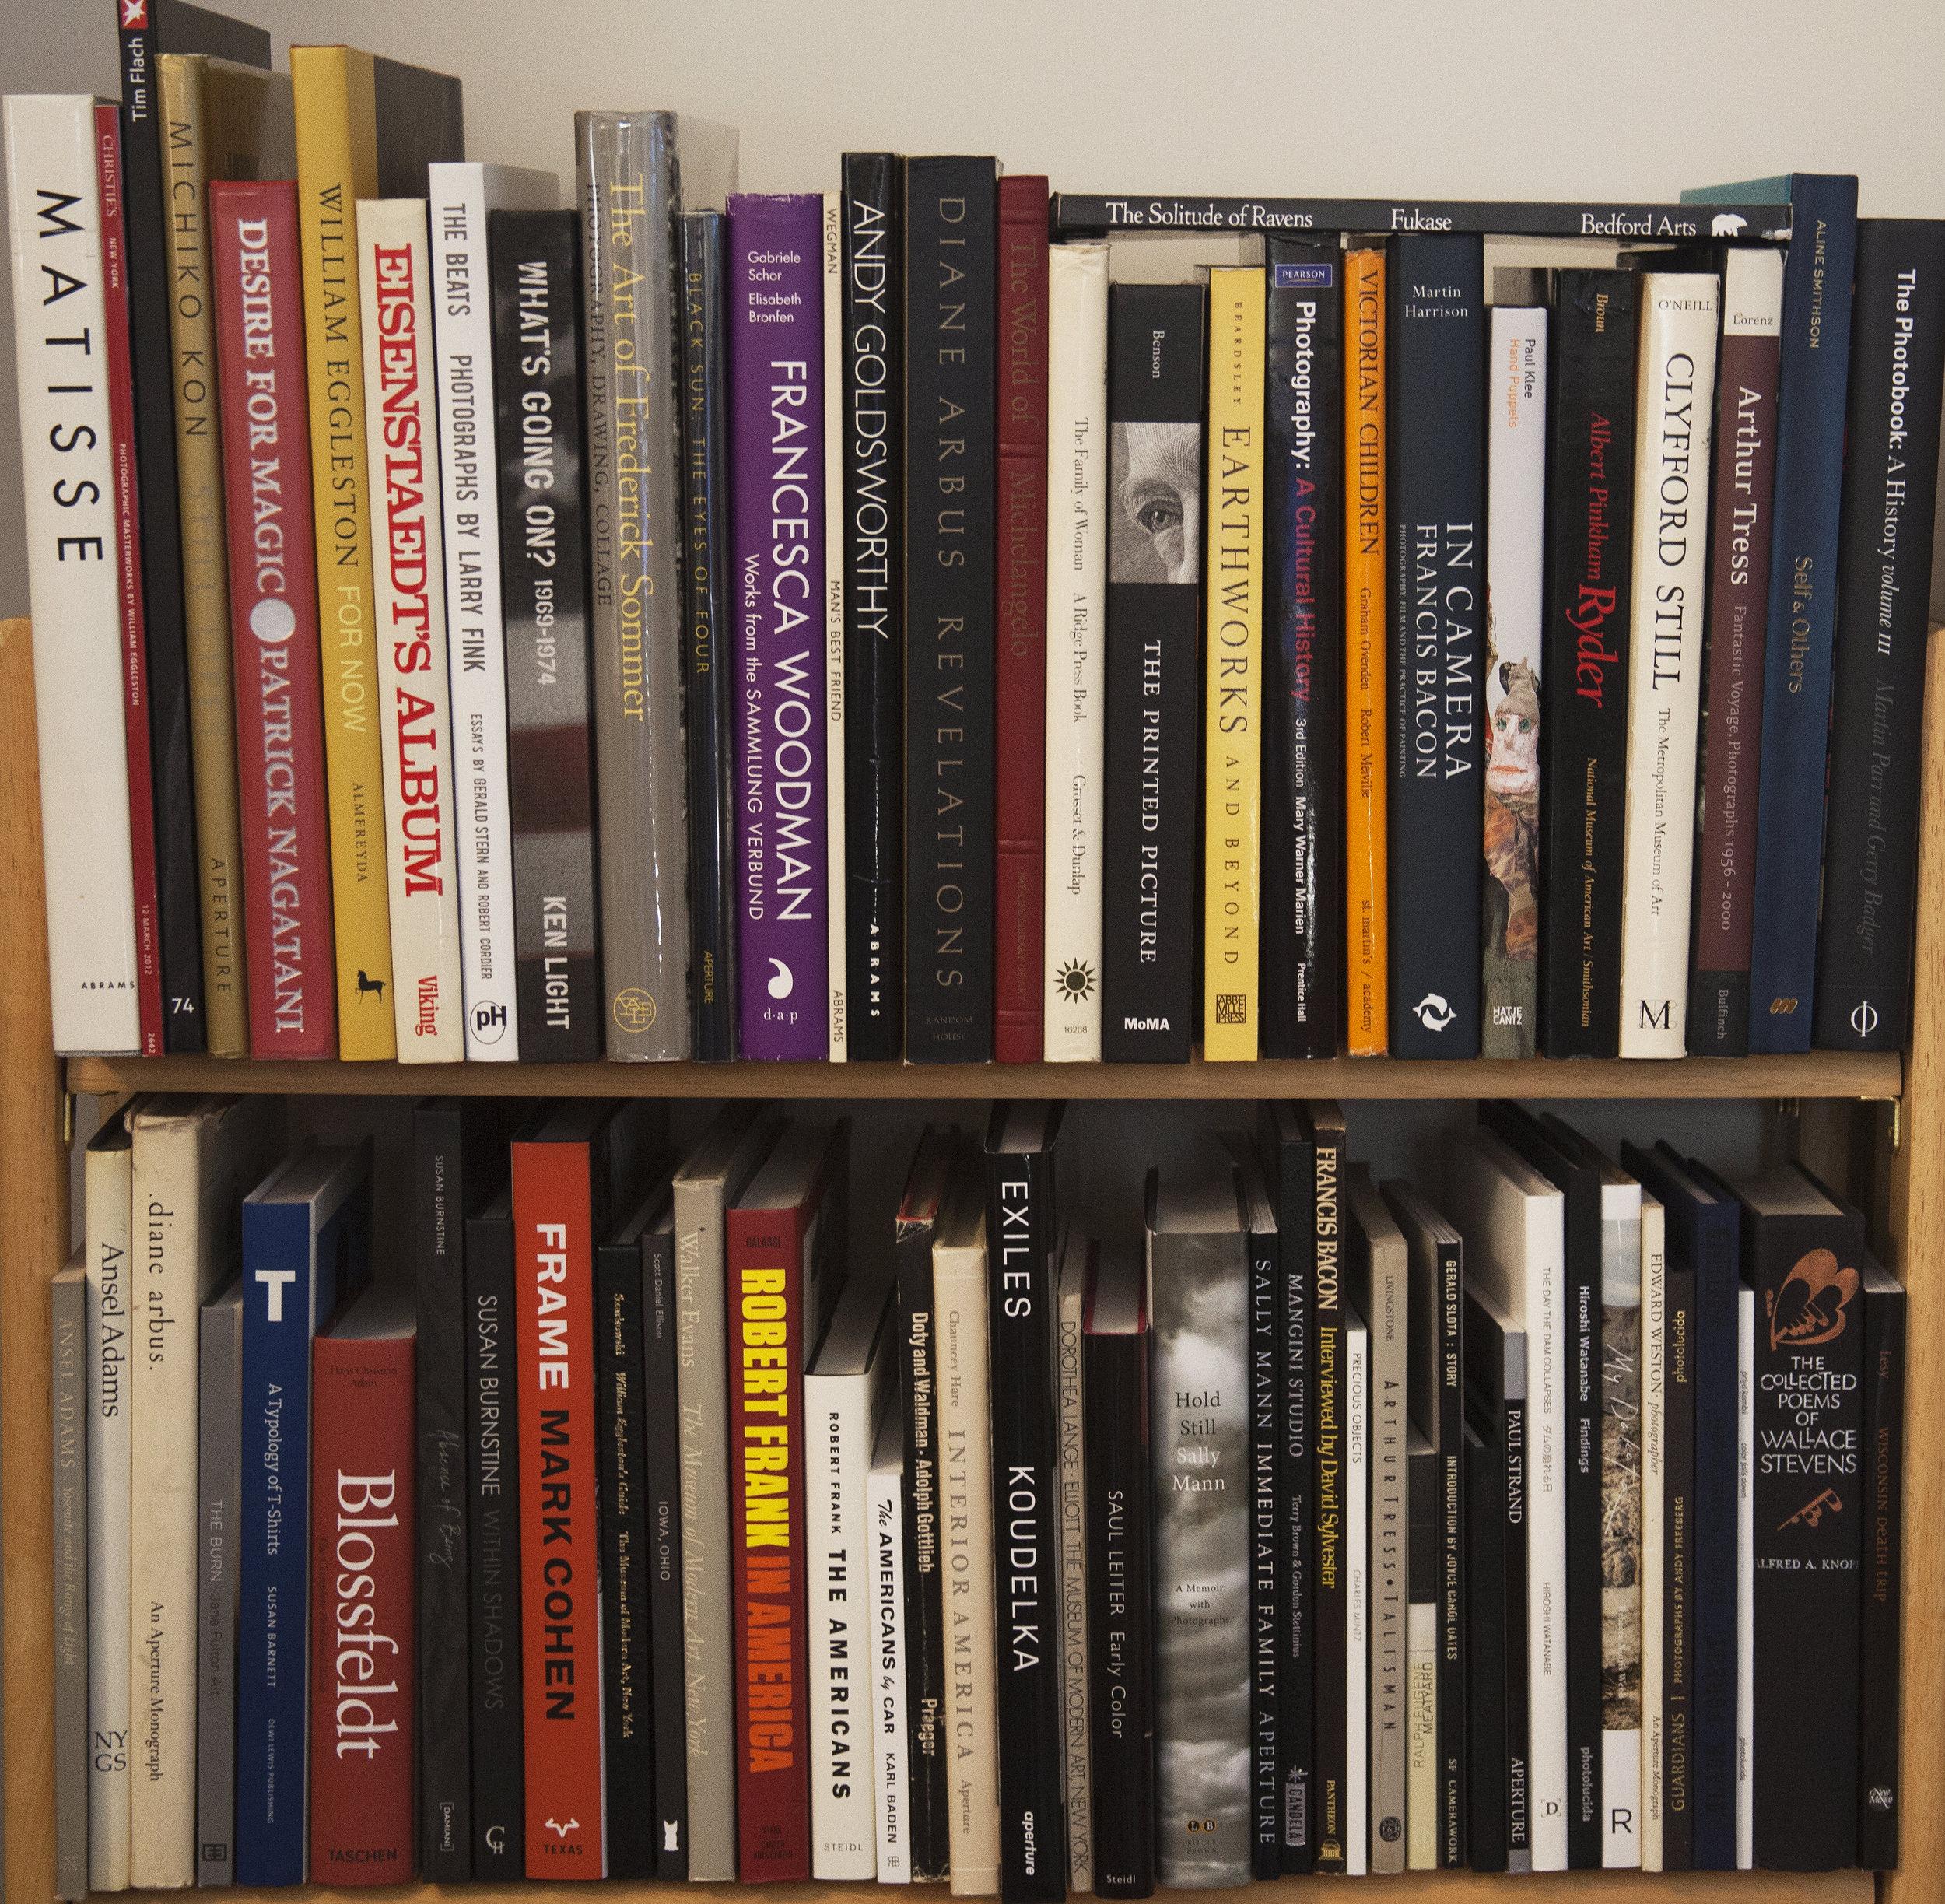 Susan Keiser 's orderly volumes.